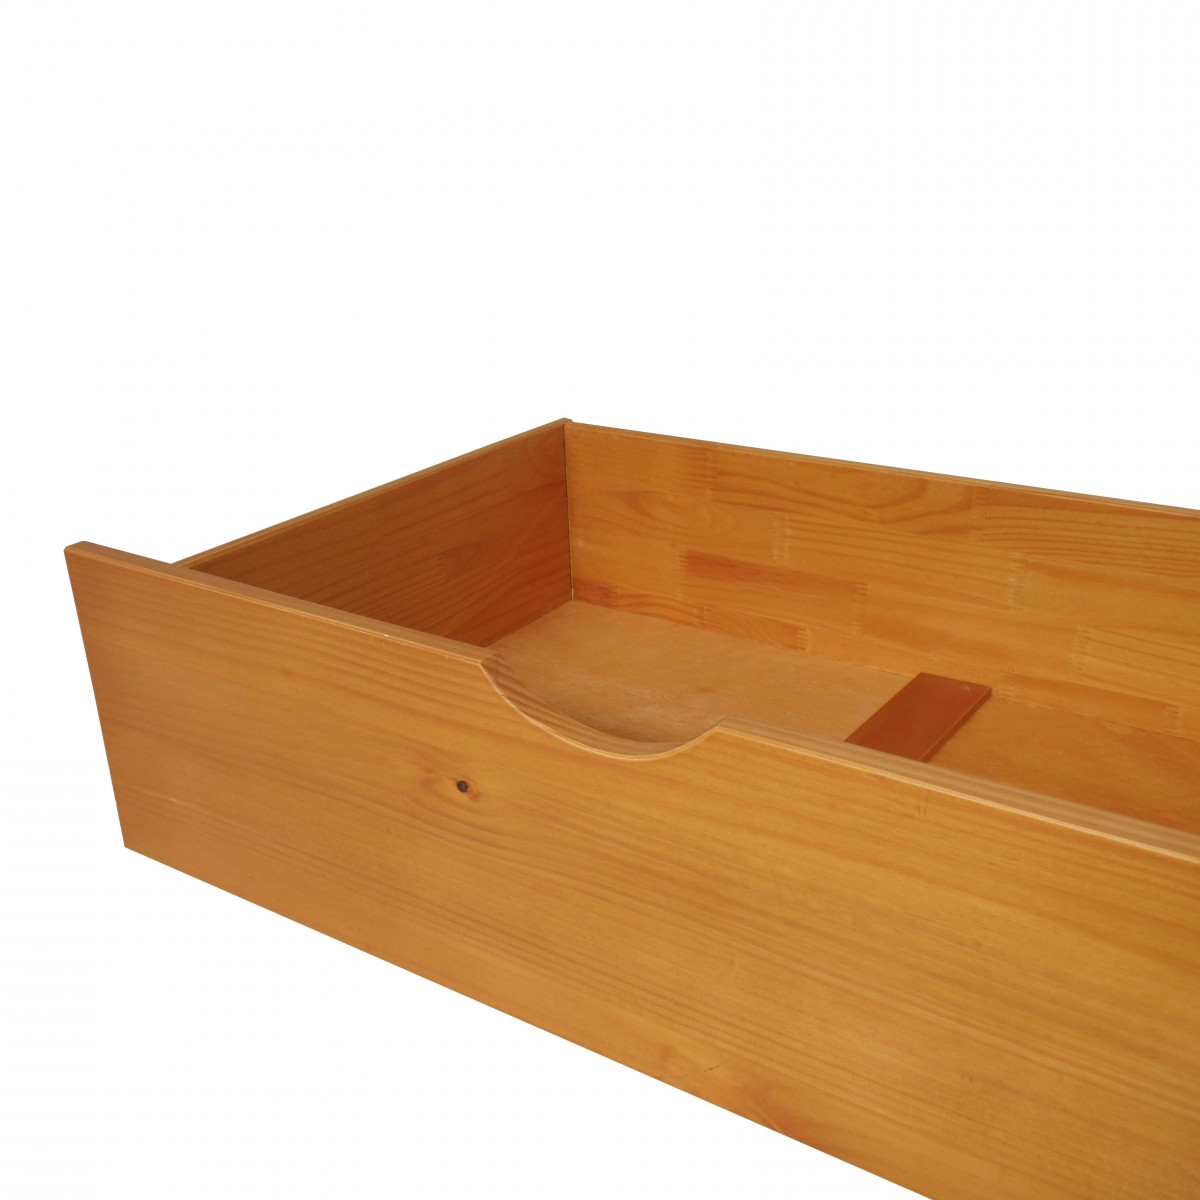 Honey Pine Underbed Storage Drawers - Pair